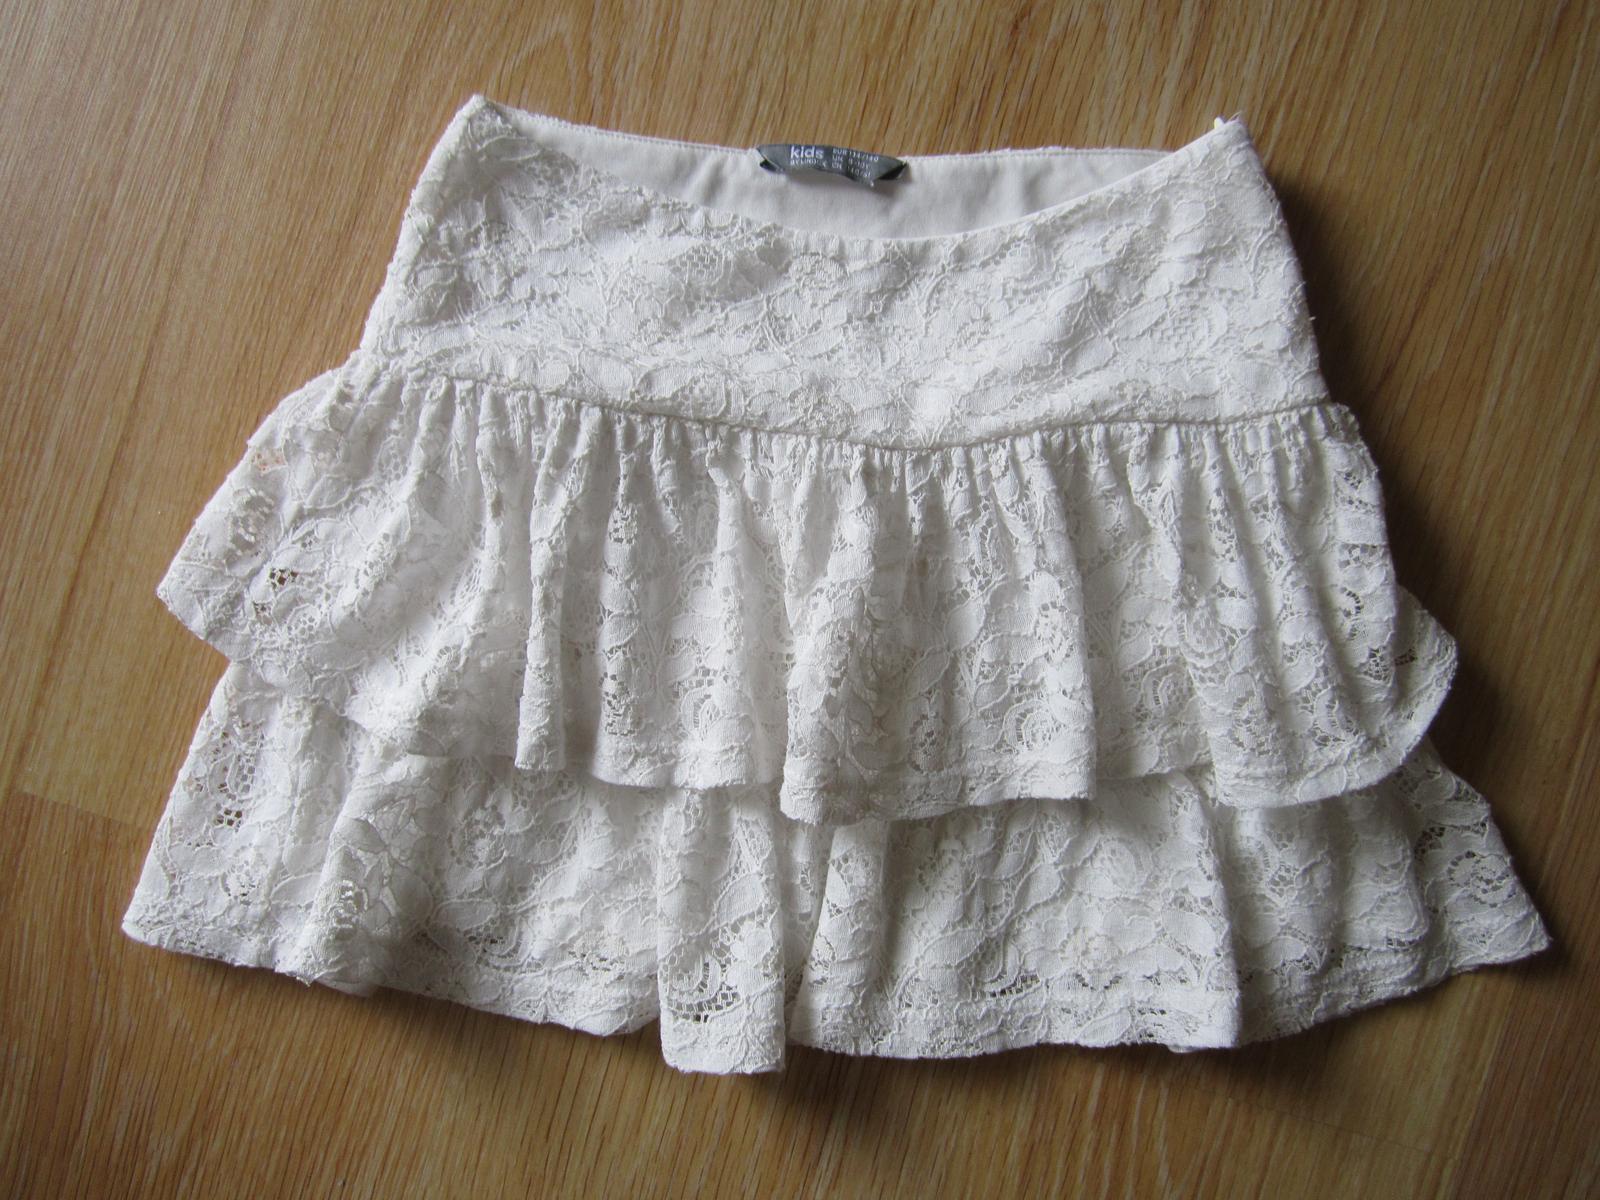 čipkovaná suknička - Obrázok č. 1